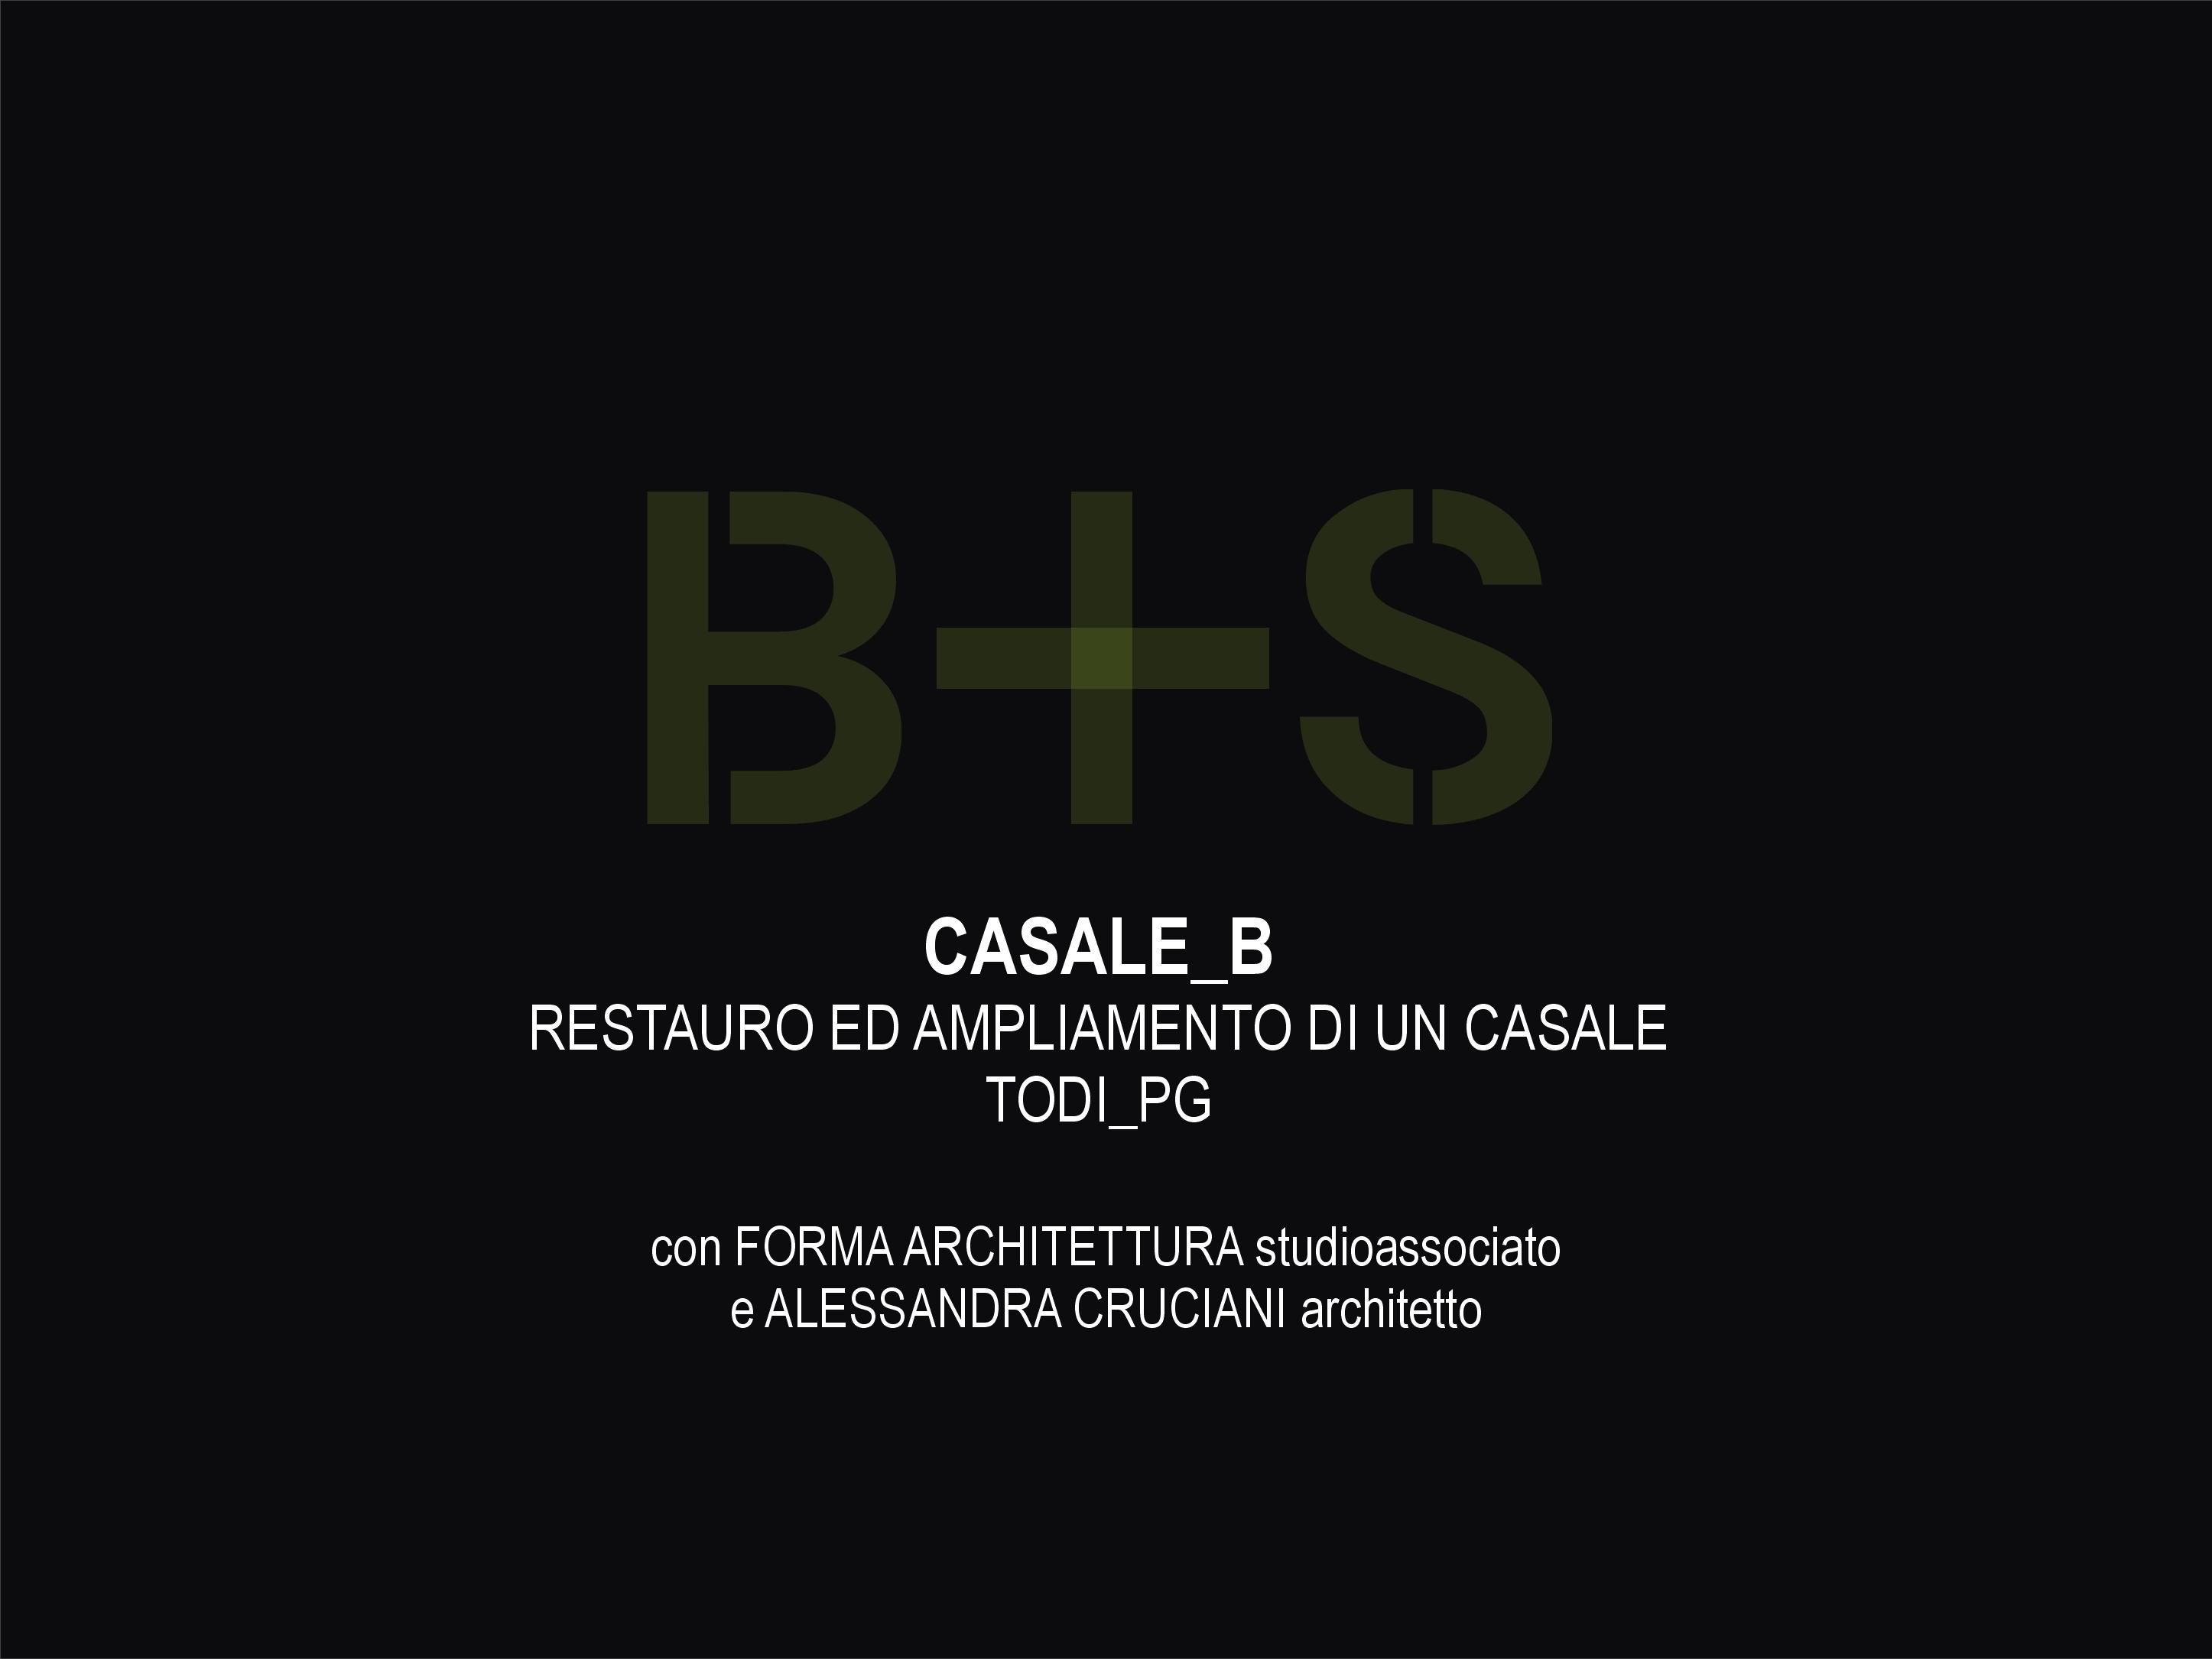 casale_B